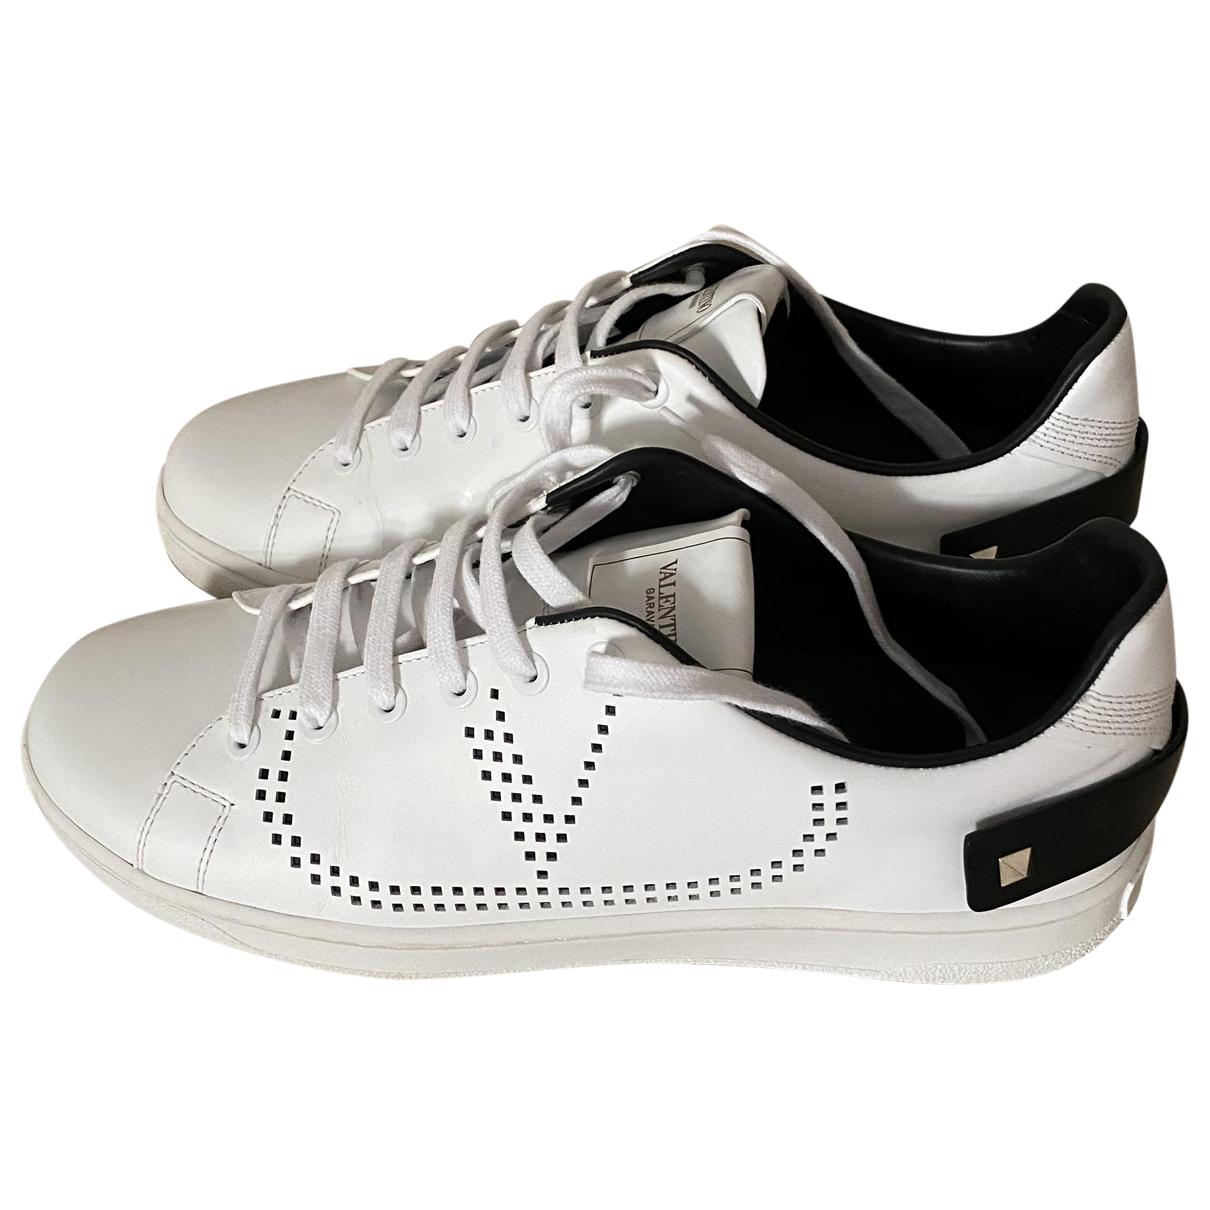 Valentino Garavani - Baskets   pour femme en cuir - blanc